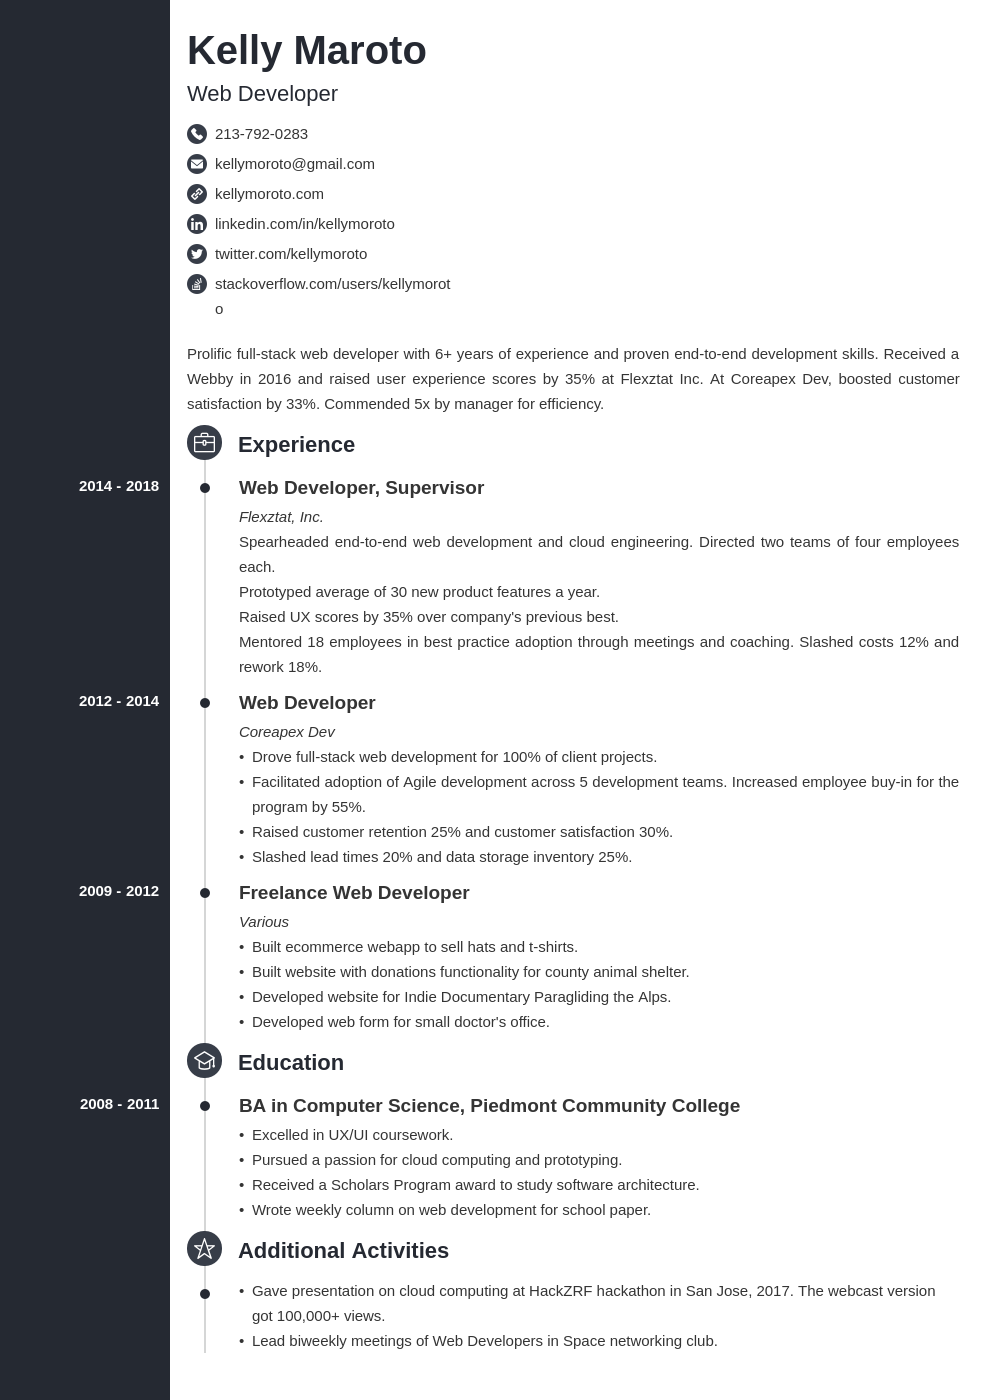 web developer template concept